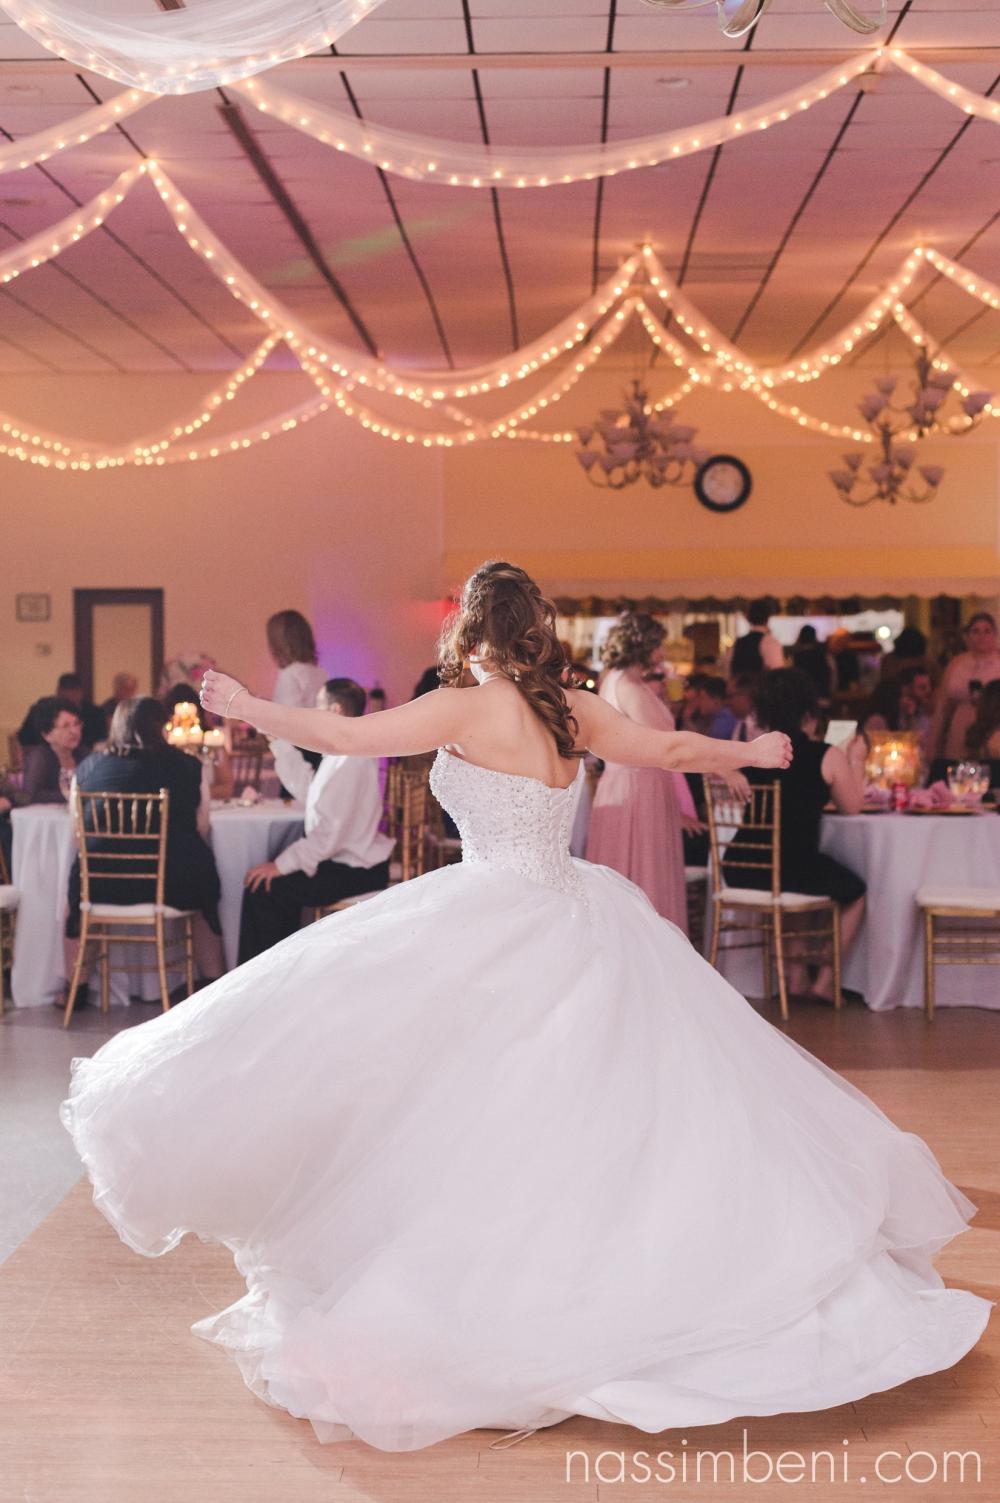 light-and-airy-port-st-lucie-wedding-photographer-nassimbeni-photography-3